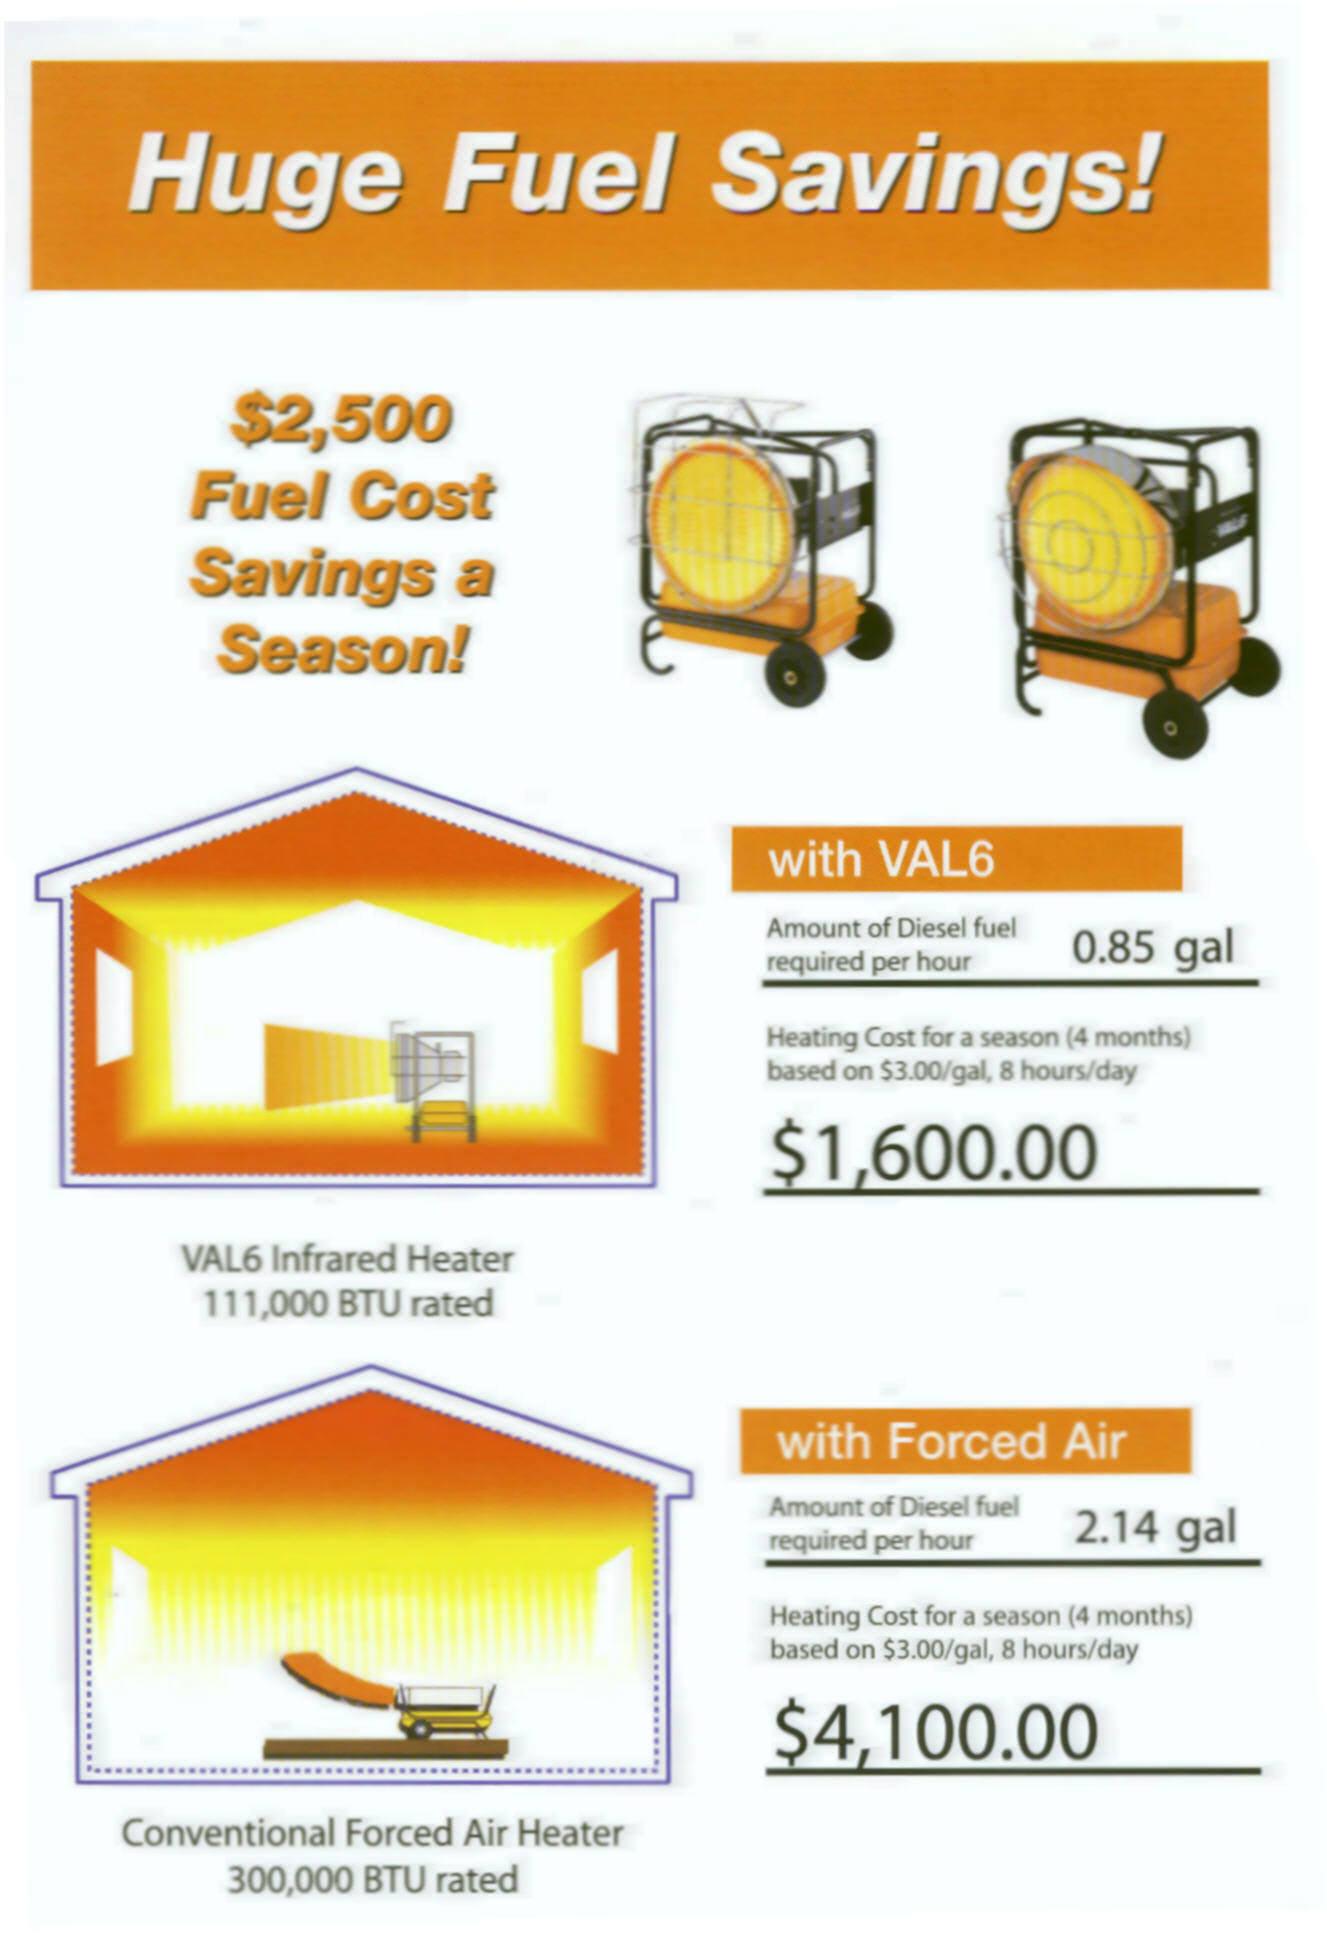 VAL6 Infrared Heater - diesel fired construction heaters, Kerosene